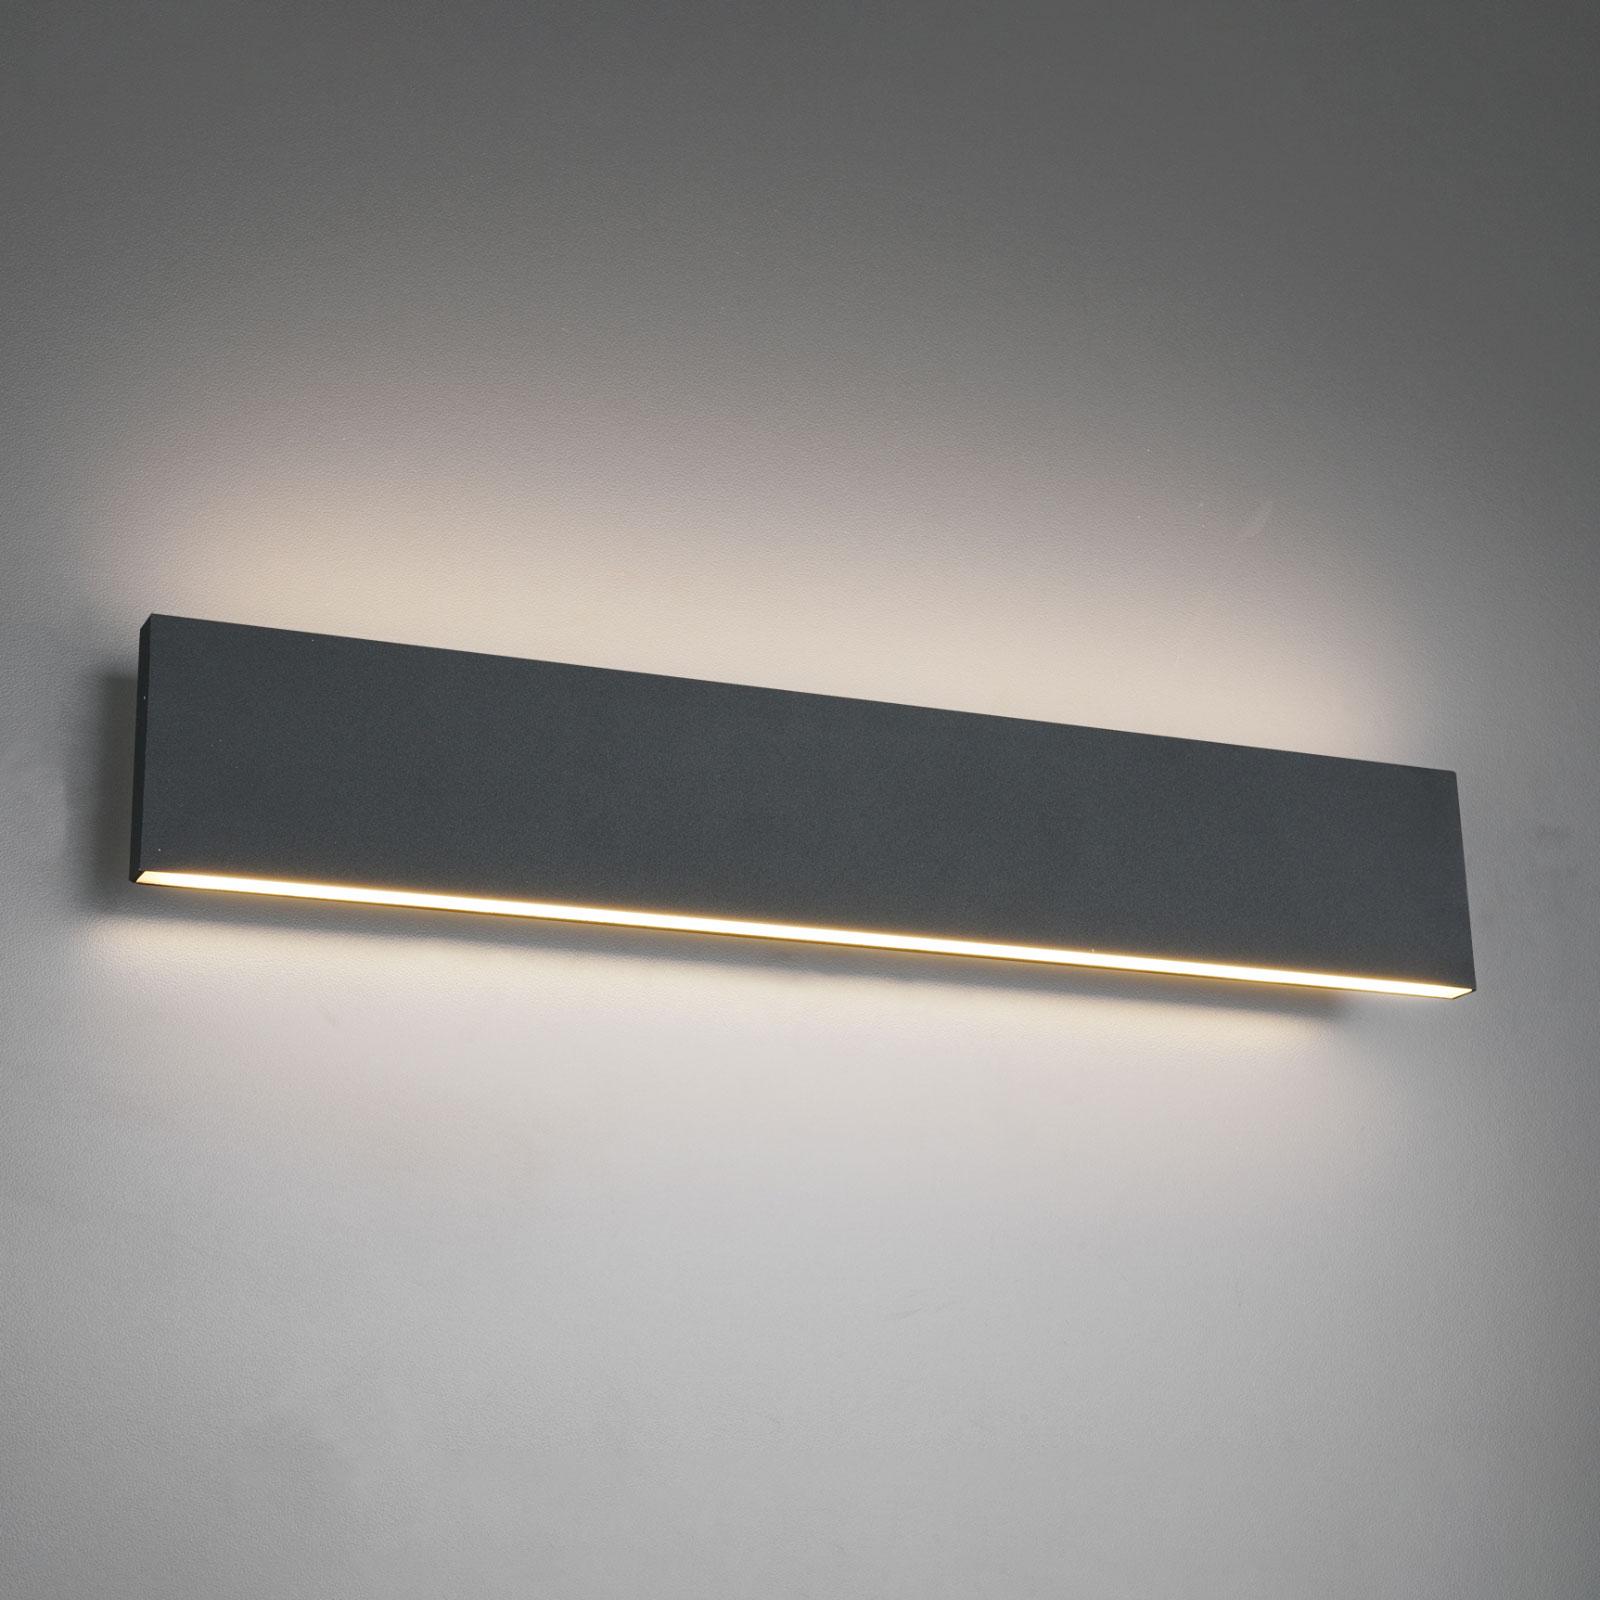 Concha-LED-seinävalaisin, 47 cm, antrasiitti